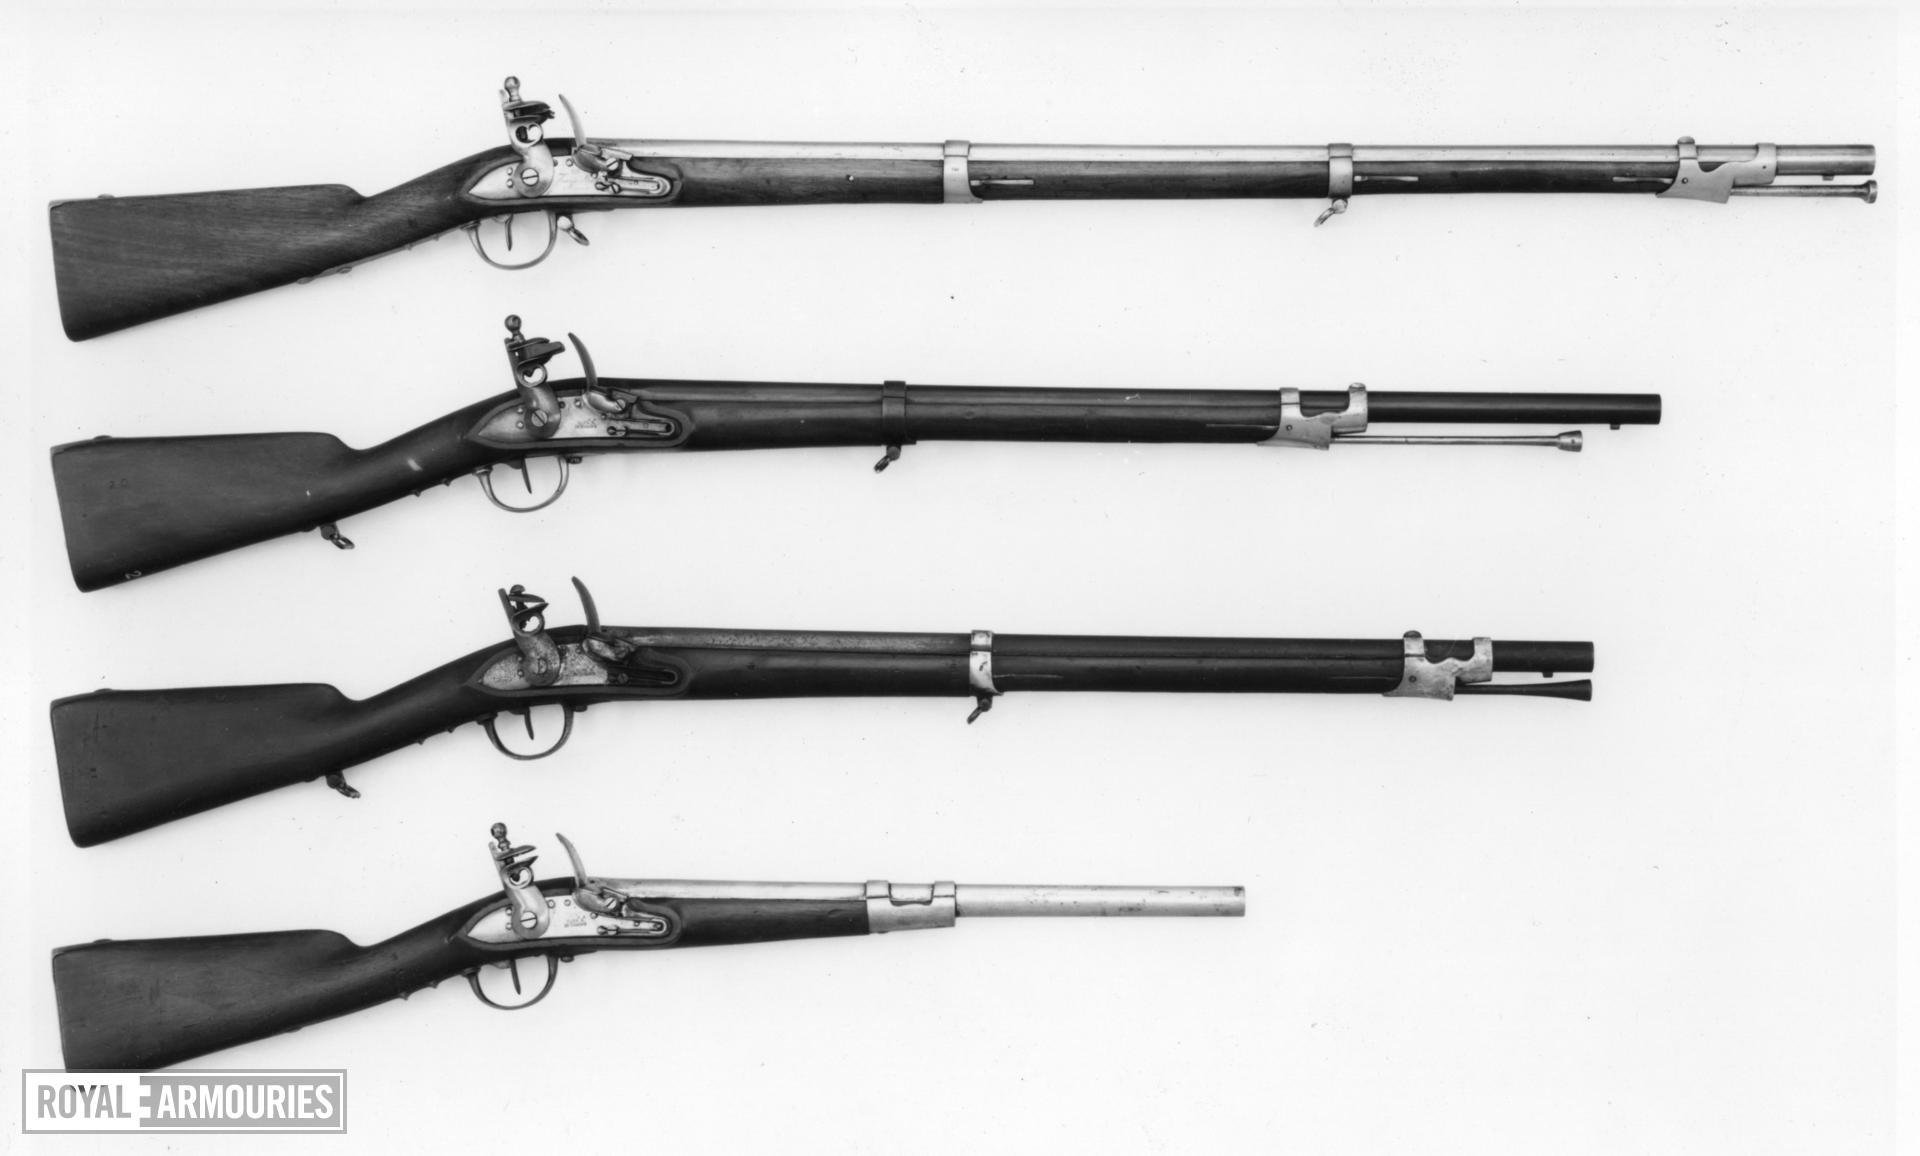 Flintlock muzzle-loading carbine - Carabinieri Model 1814 Flintlock muzzle-loading carbine, Carabinieri Model 1814, about 1830.